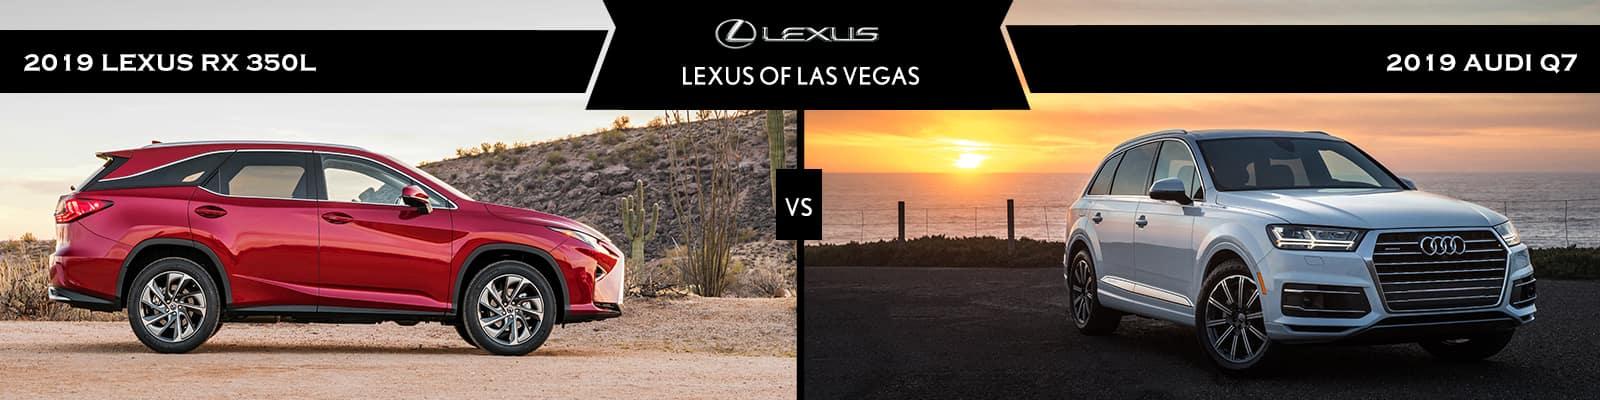 Lexus Vs Audi >> Lexus Rx L Vs Audi Q7 Luxury Crossover Comparisons Las